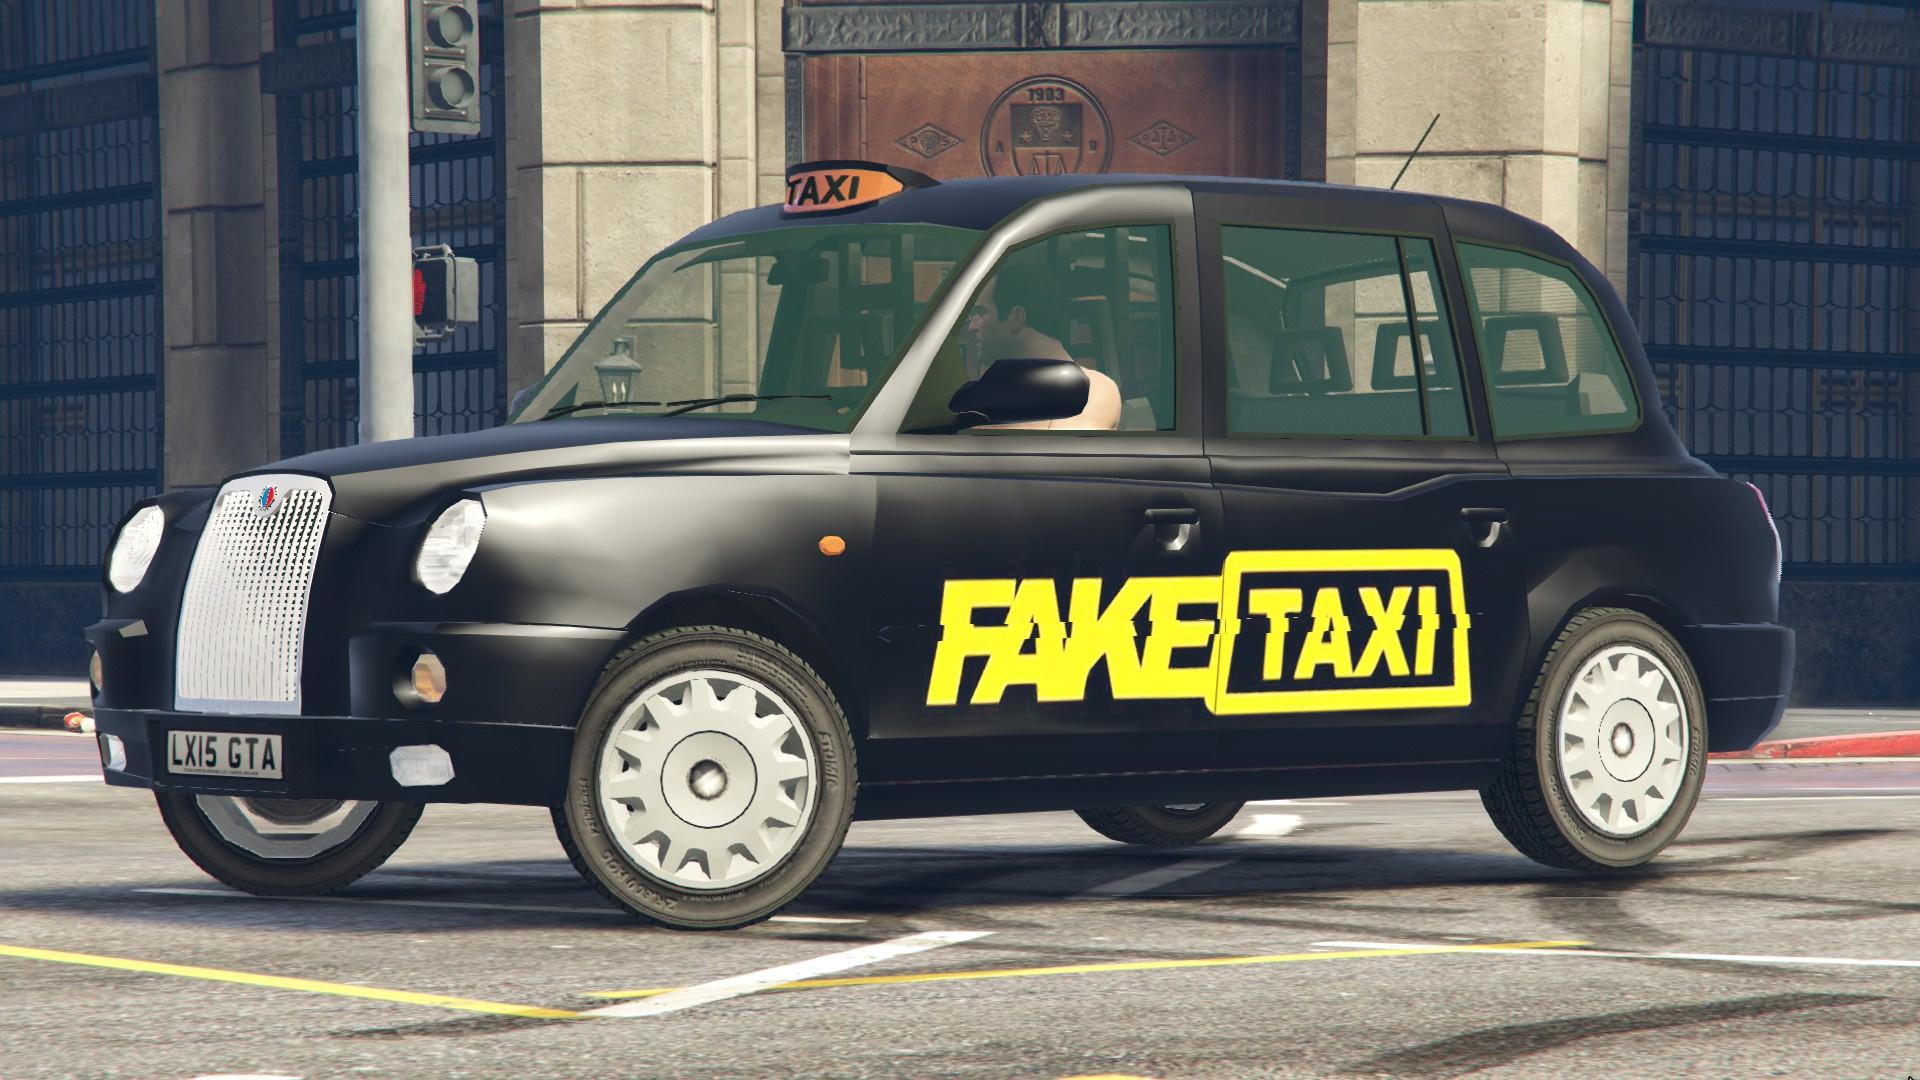 Fake raxi